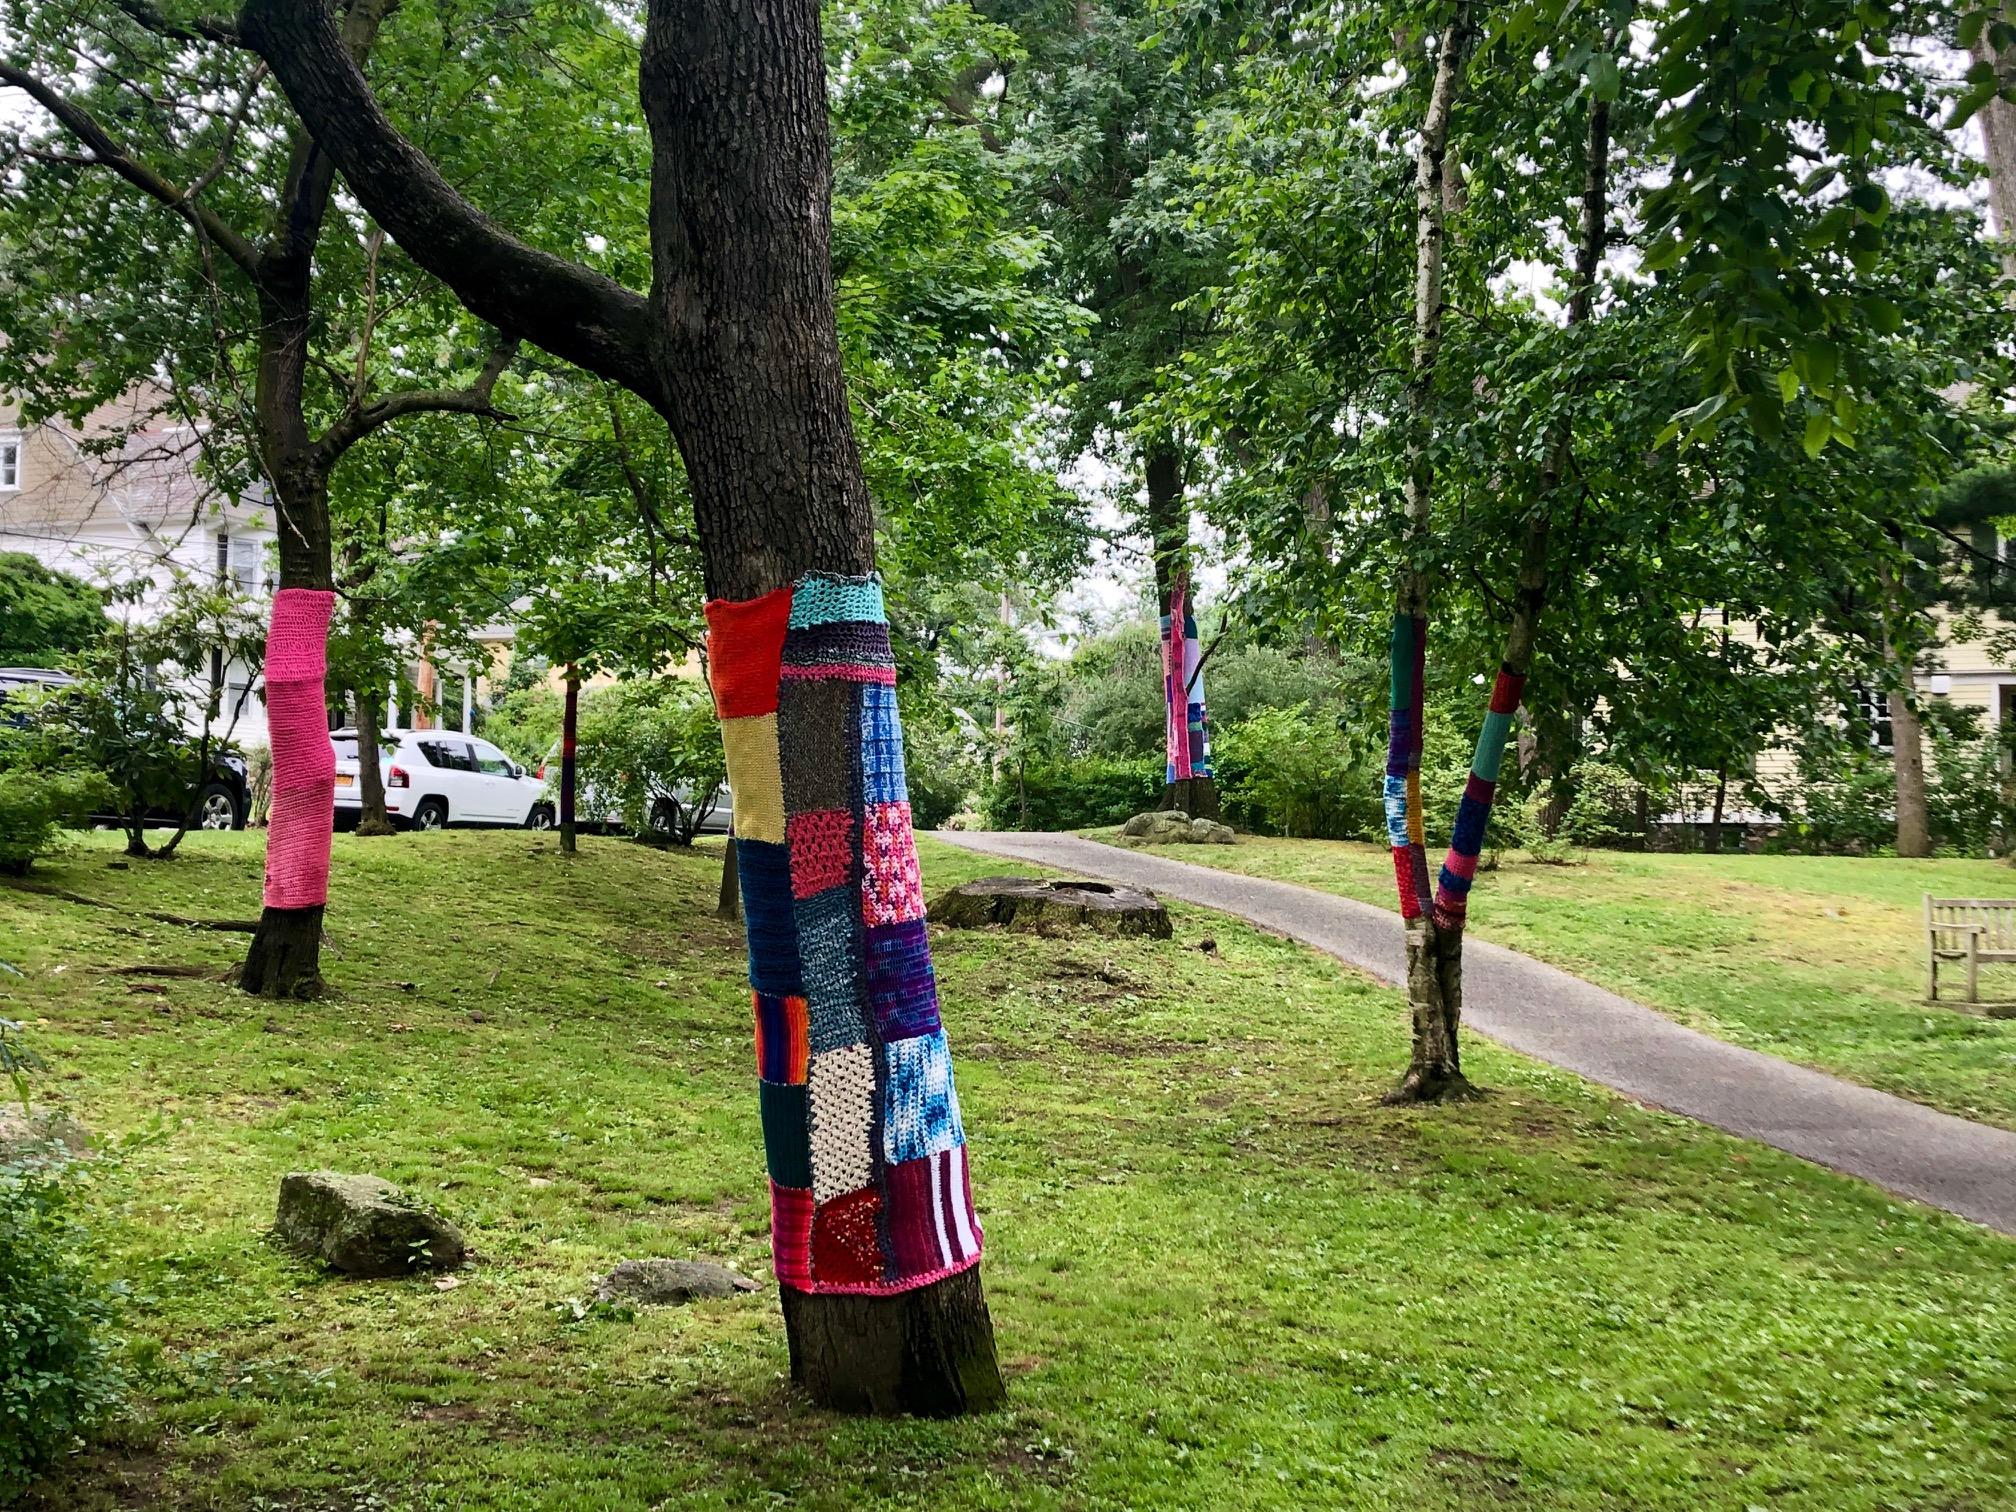 yarn bombing aka knit grafitti in Wolfs Lane Park Pelham NY